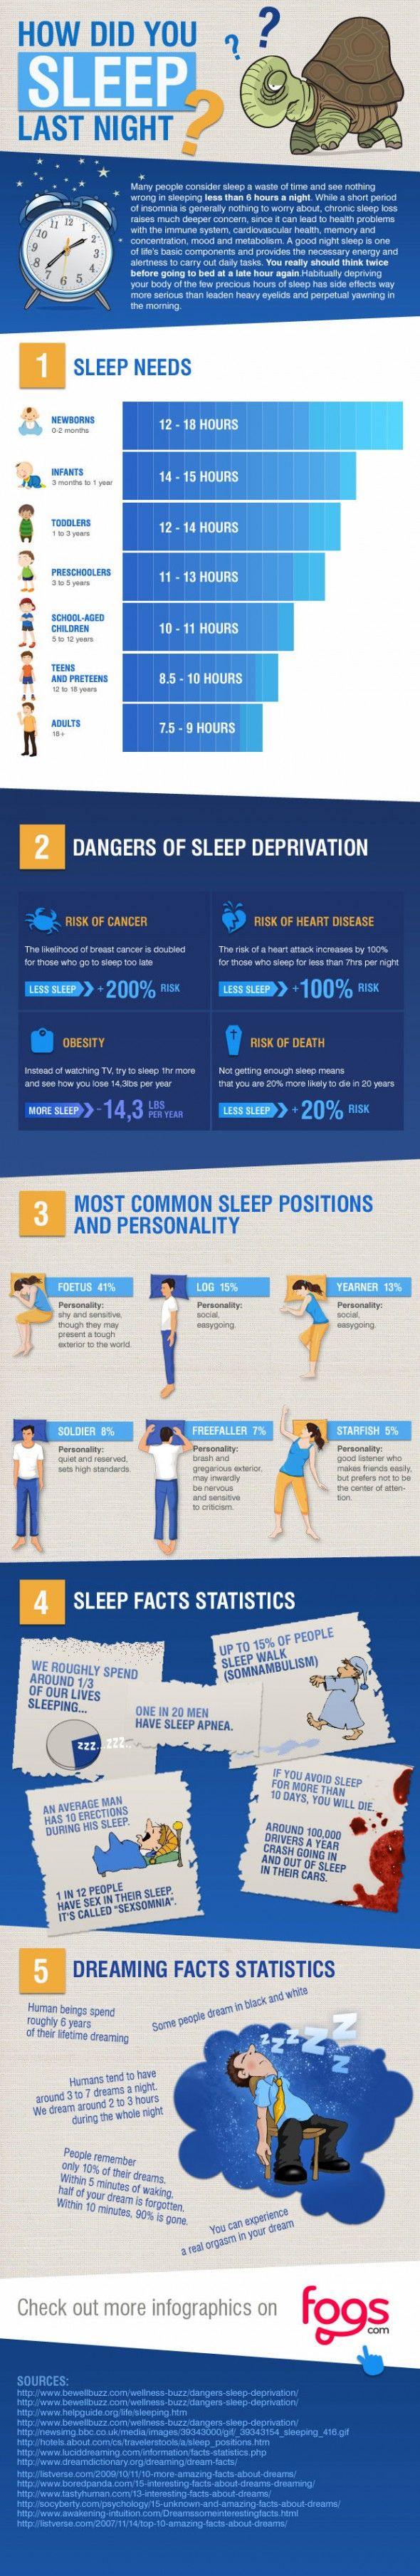 #INFOGRAPHIC: HOW DID YOU SLEEP LAST NIGHT?